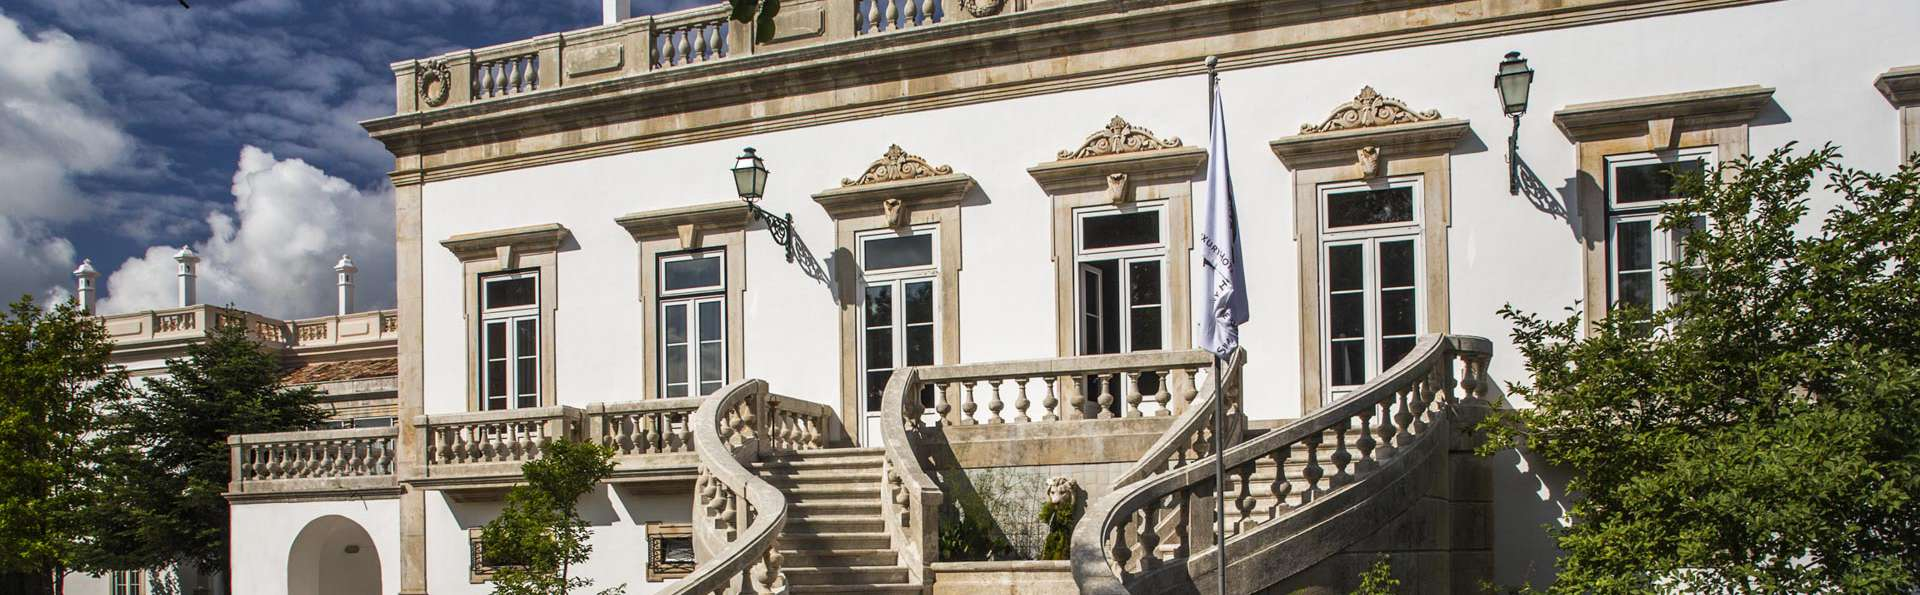 Quinta das Lágrimas Palace  - EDIT_FRONT_04.jpg